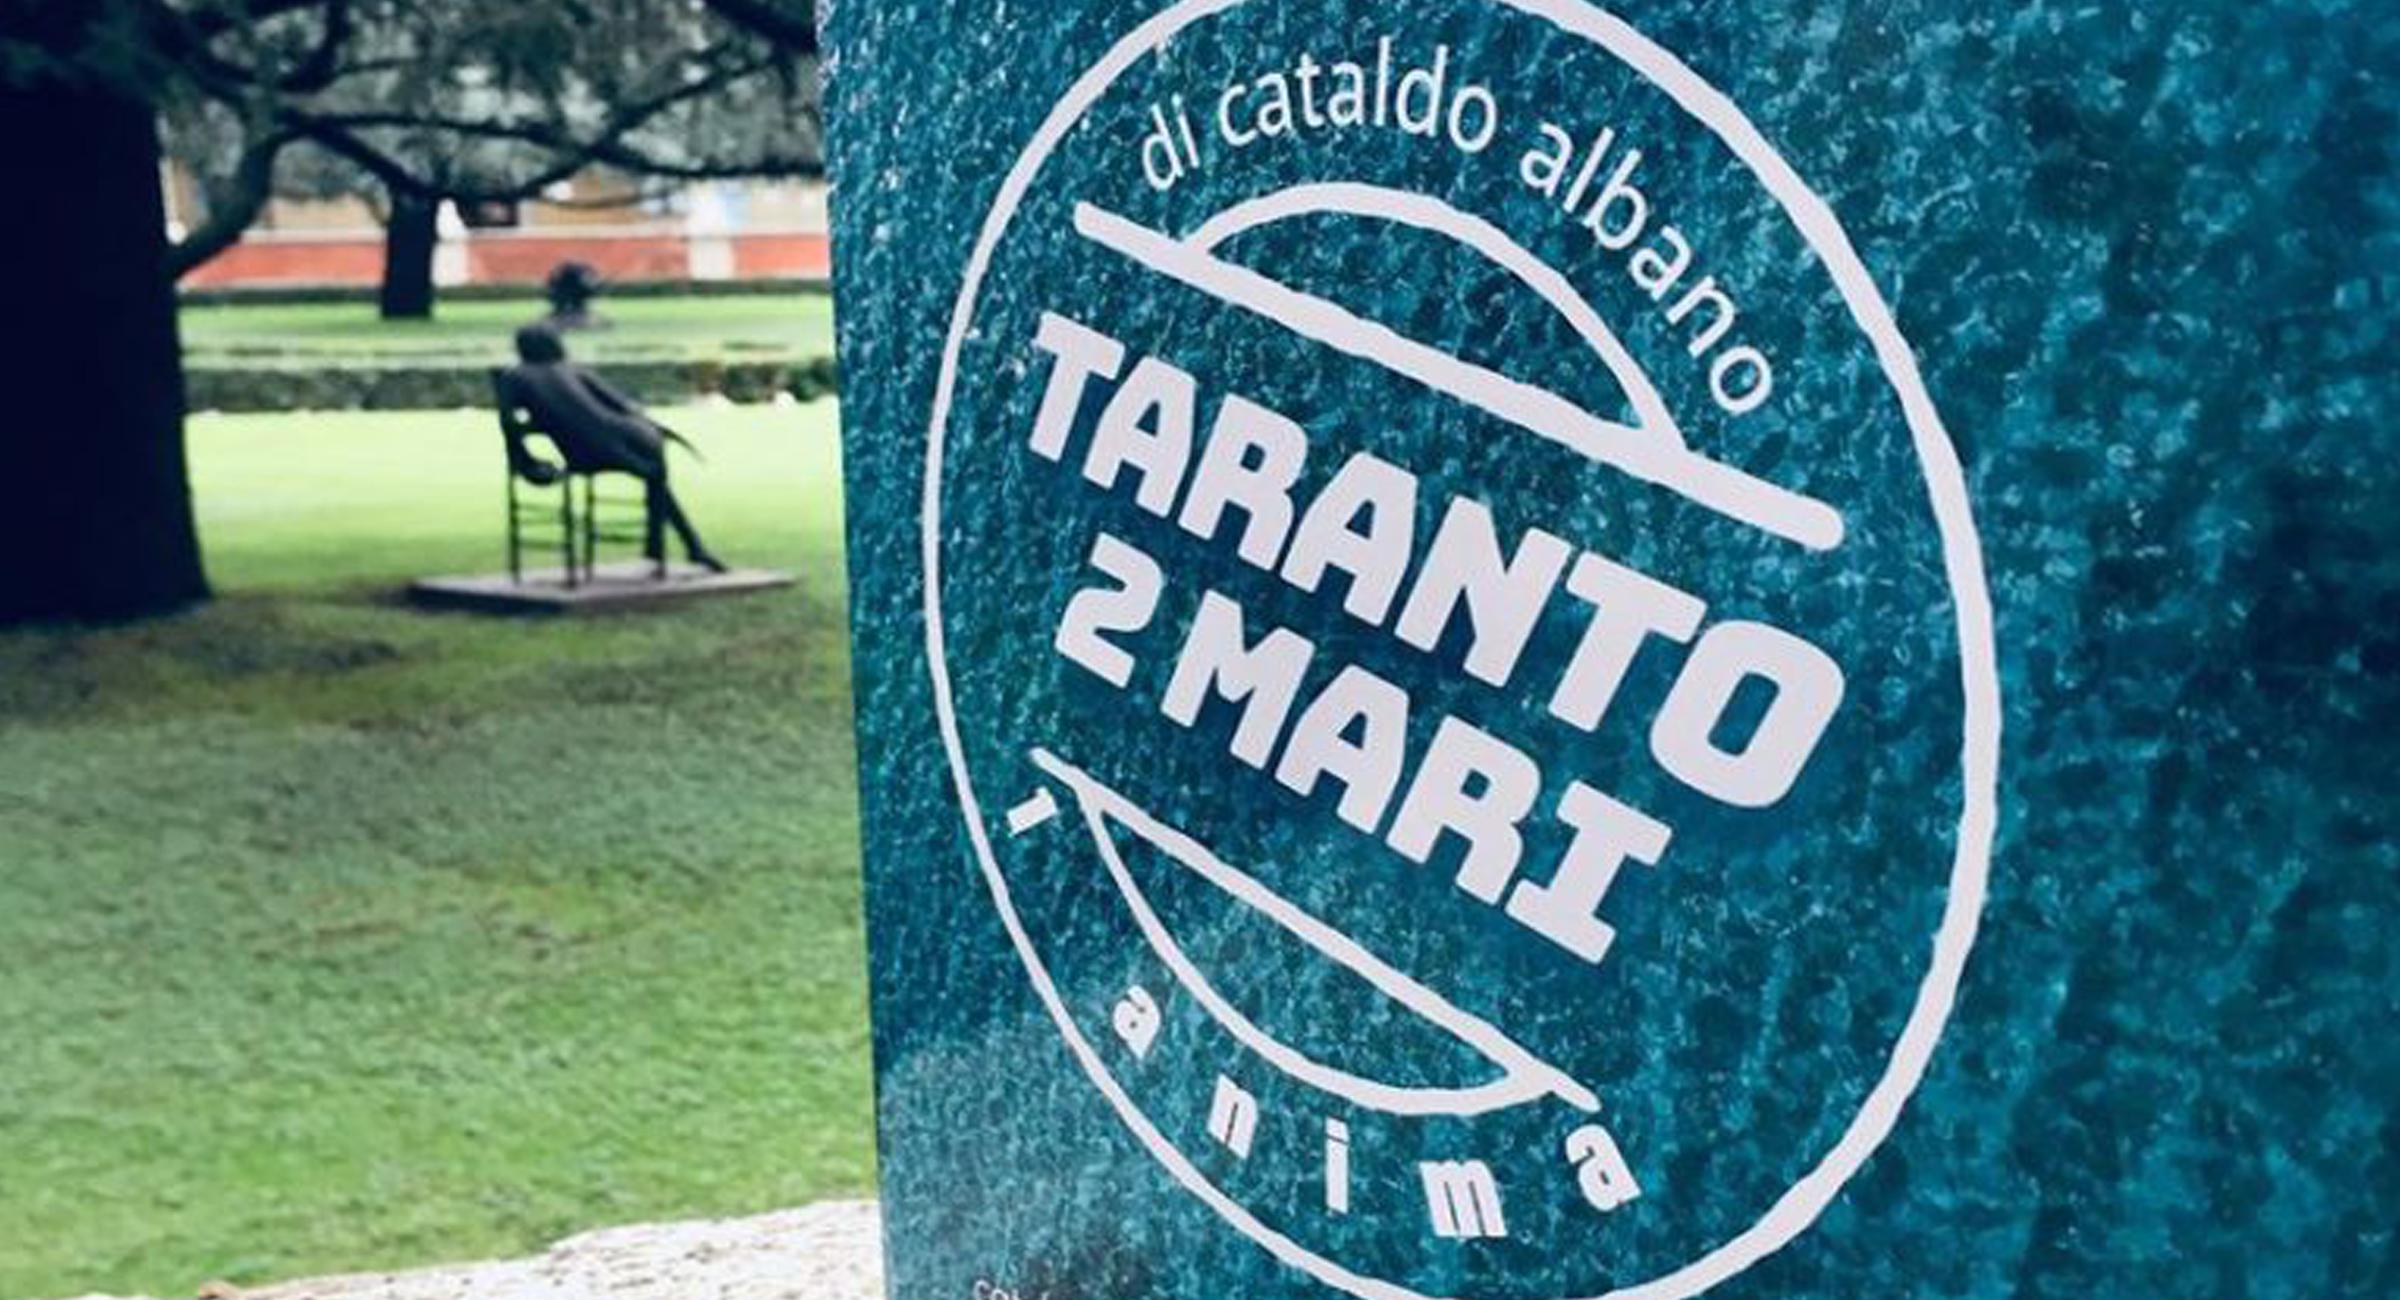 TARANTO 2 MARI 1 ANIMA  AL CASTELLO ARAGONESE DI TARANTO